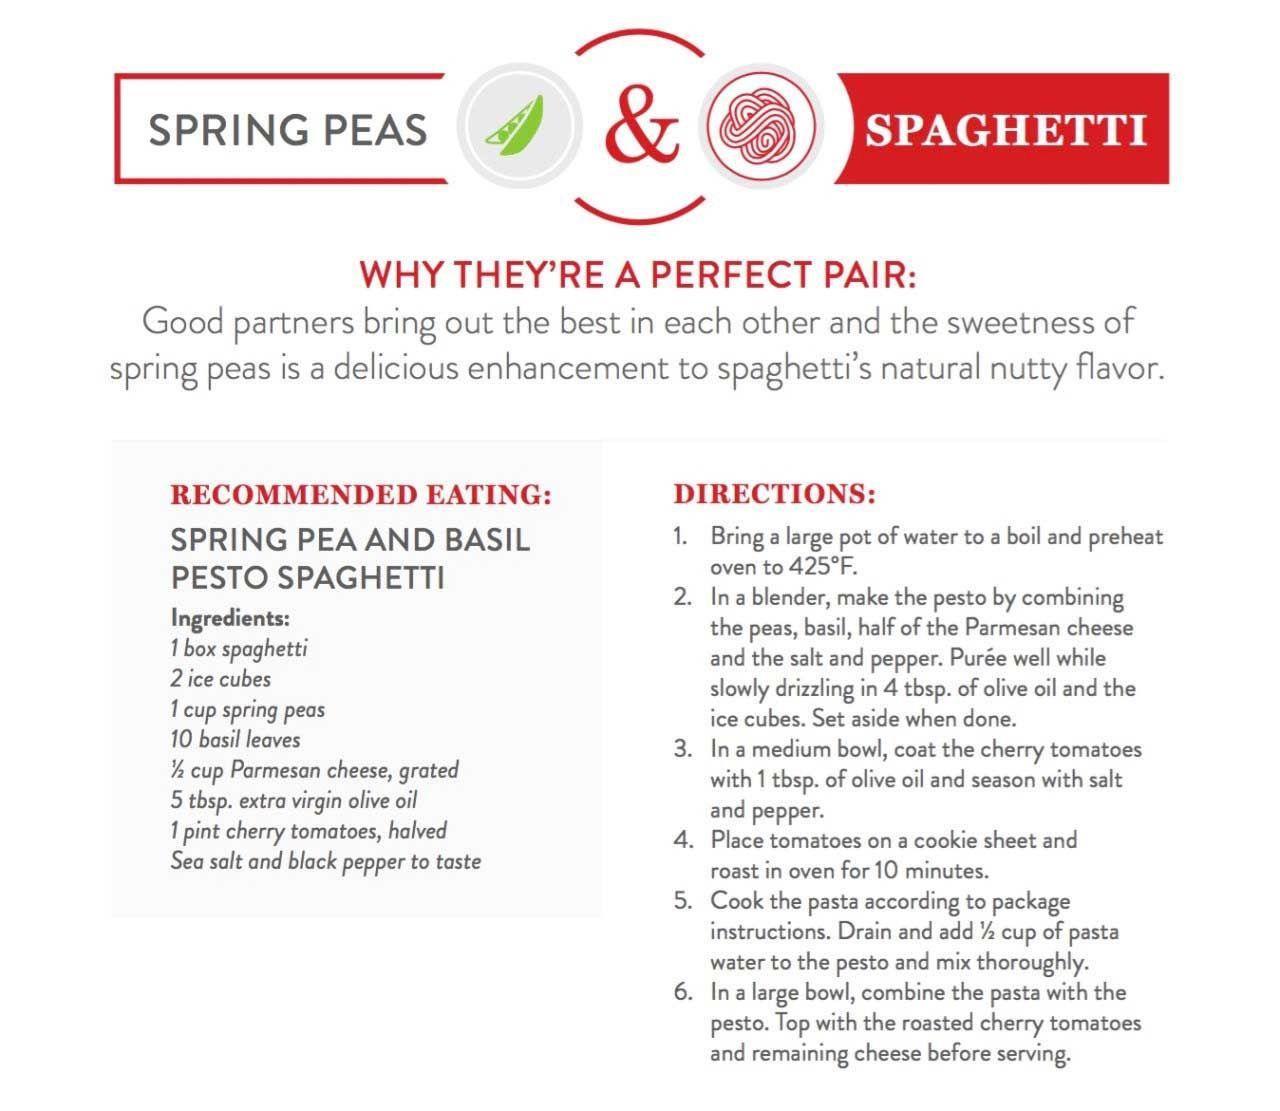 Spring Peas and Spaghetti